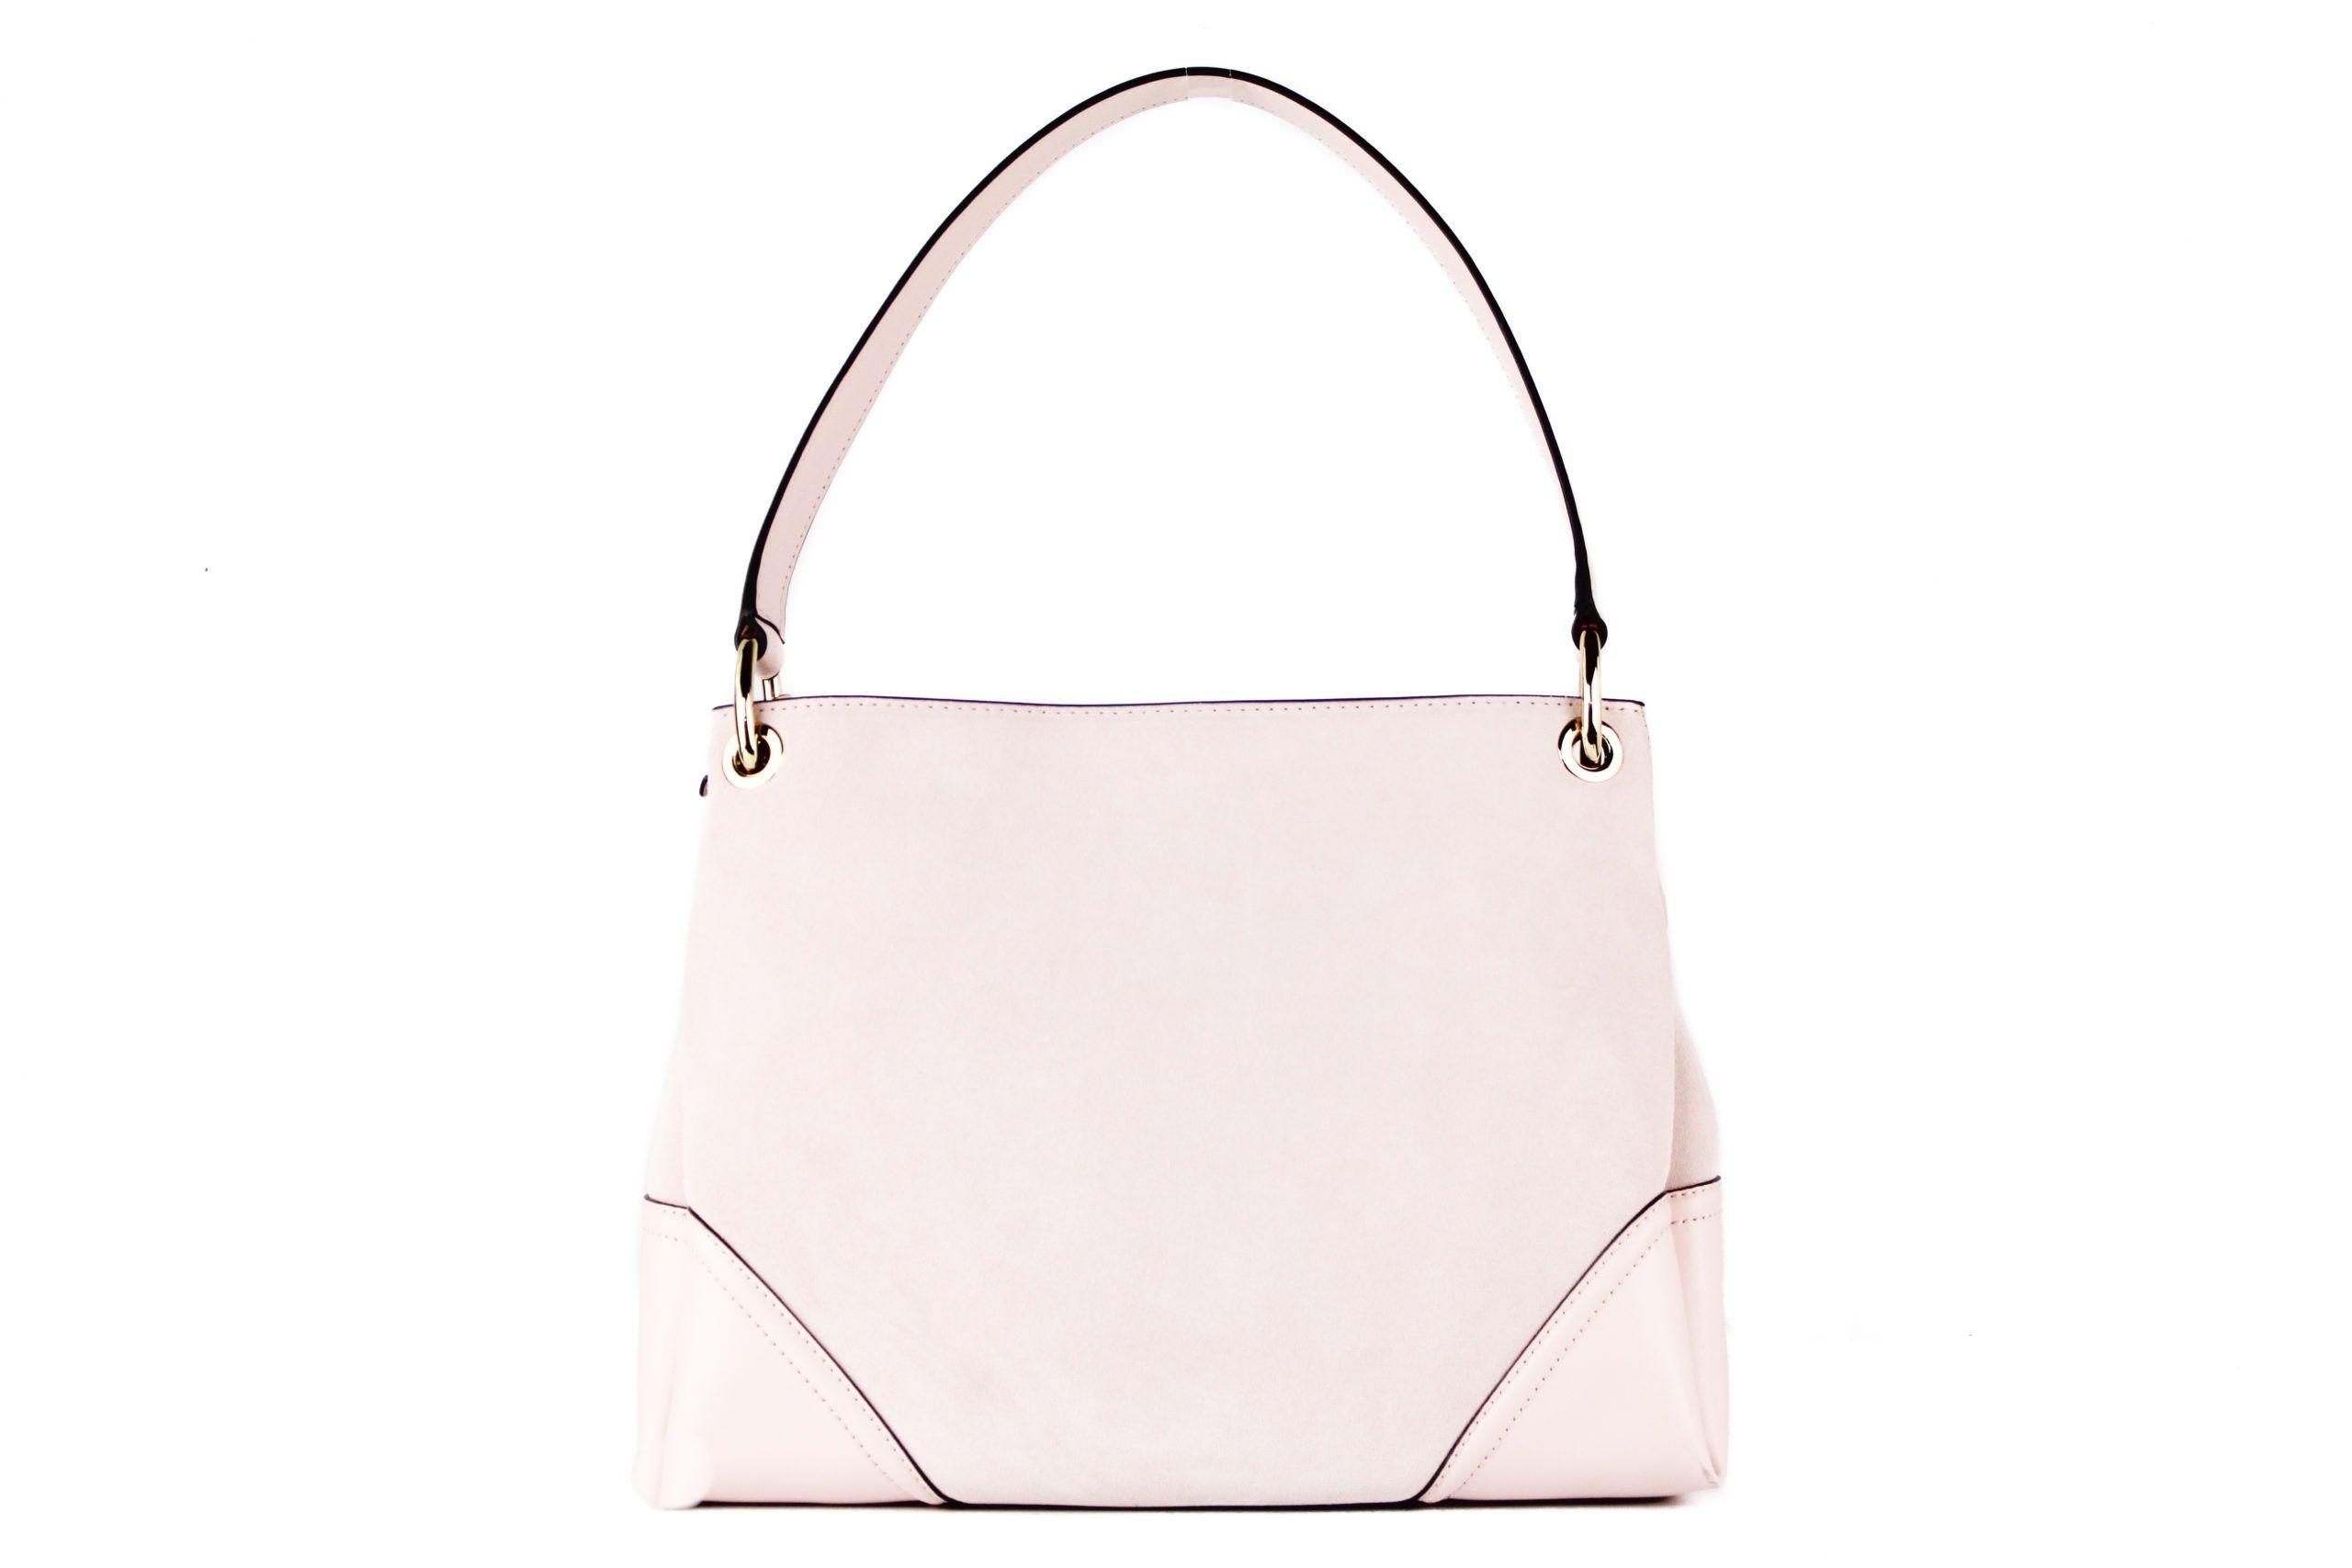 Michael Kors Nicole Medium Leather Suede Shoulder Handbag (Powder Blush Solid)